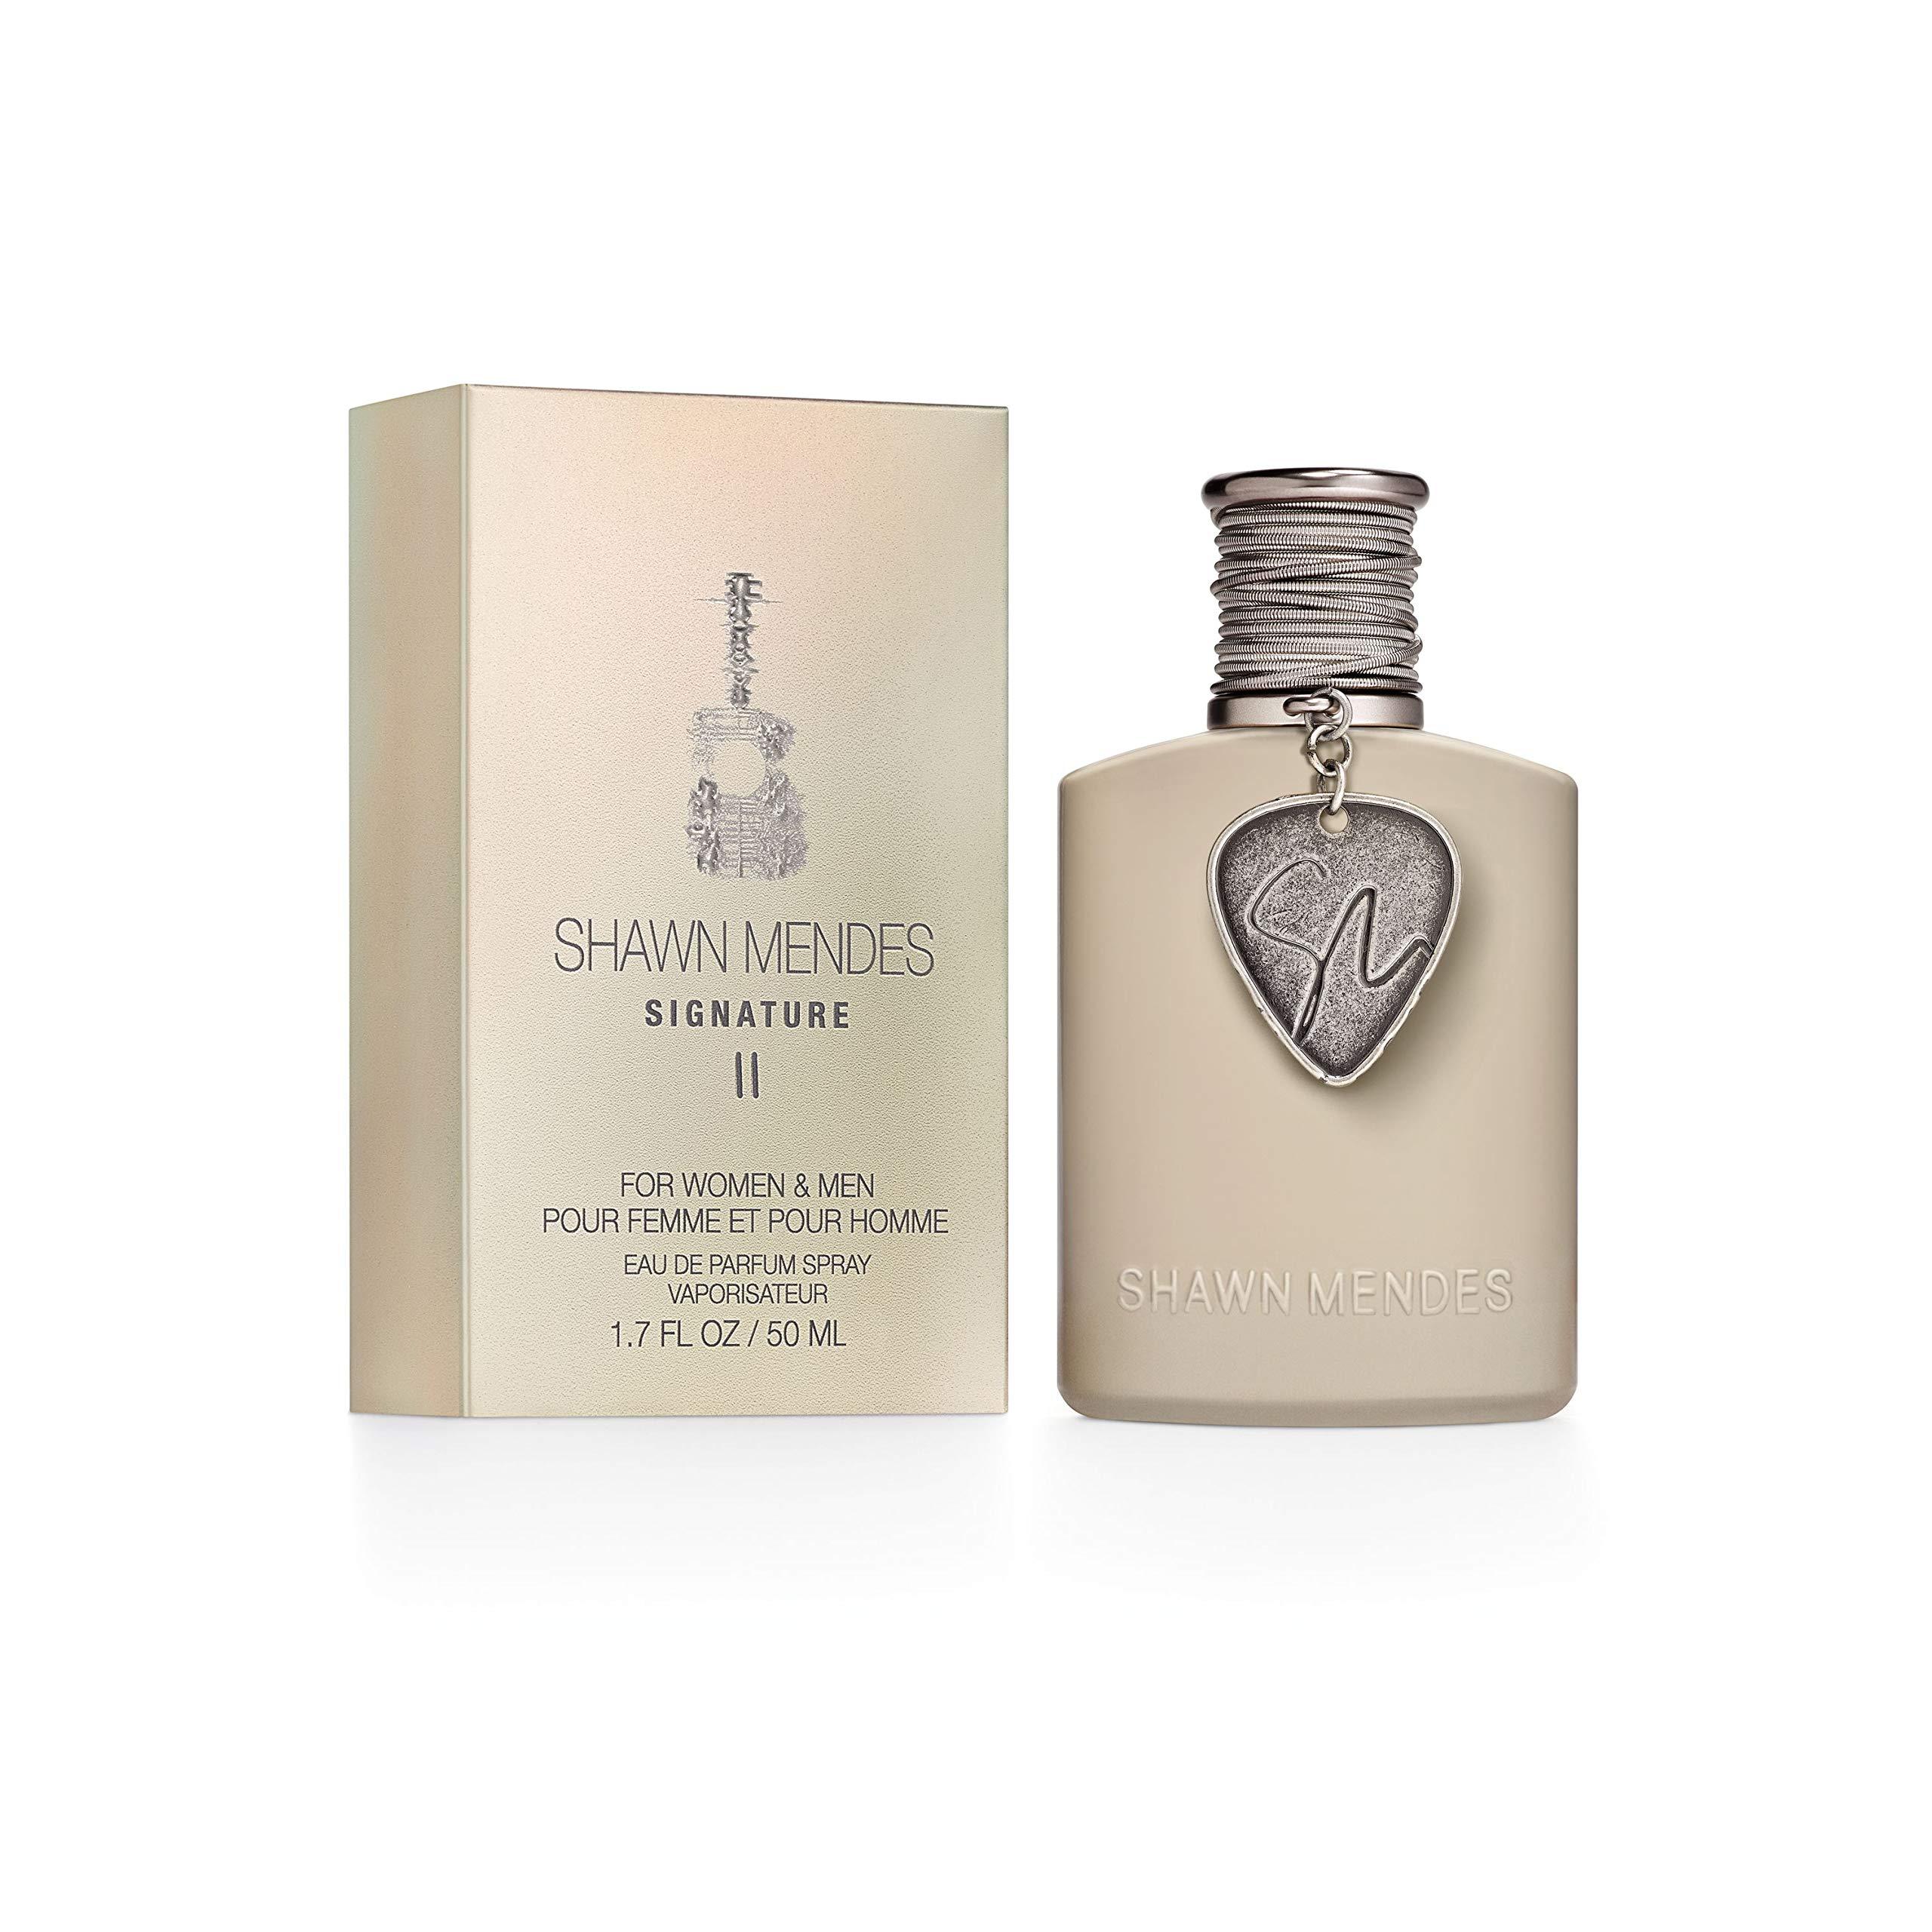 Shawn Mendes Signature II Eau De Parfum Spray For Women and Men, 50ml